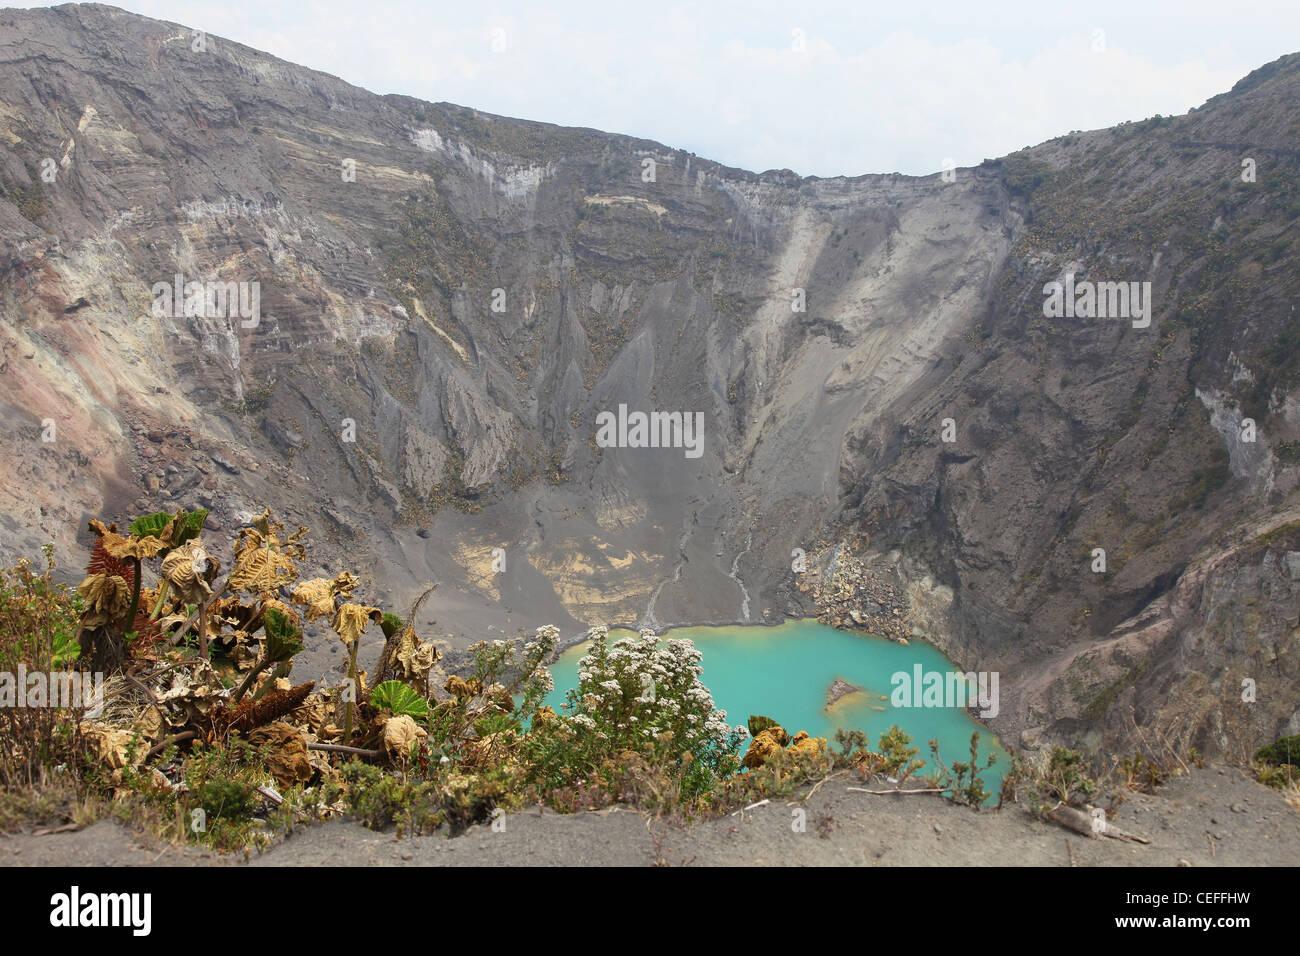 See in die Caldera des Vulkans Irazú oder Volcán Irazú aktiver Vulkan in Costa Rica, Mittelamerika Stockbild